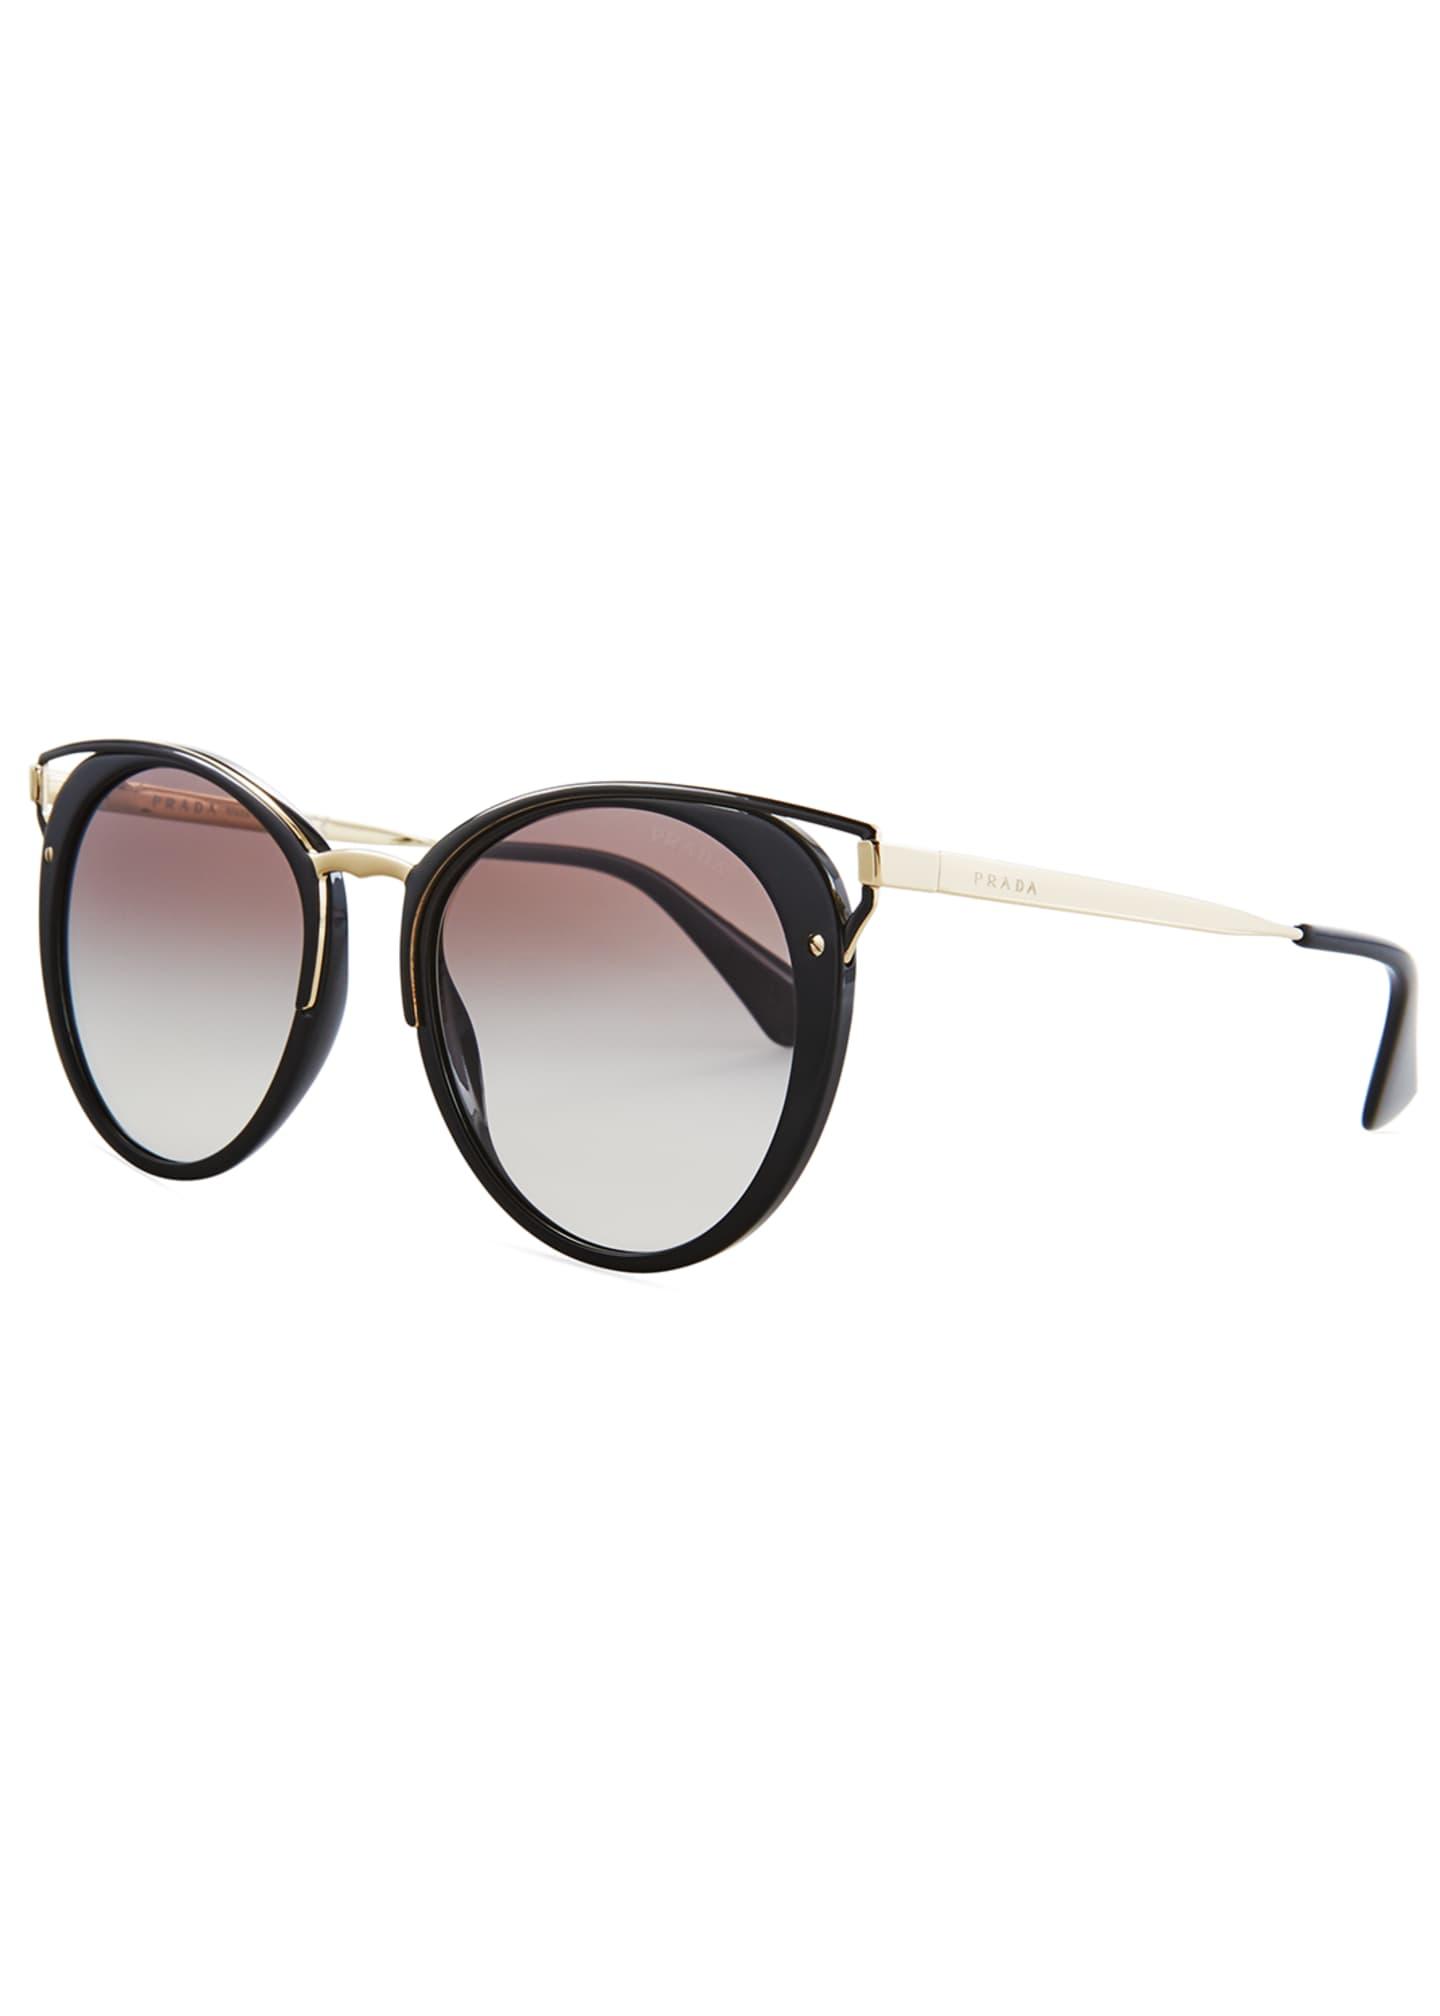 Prada Cutout Round Sunglasses